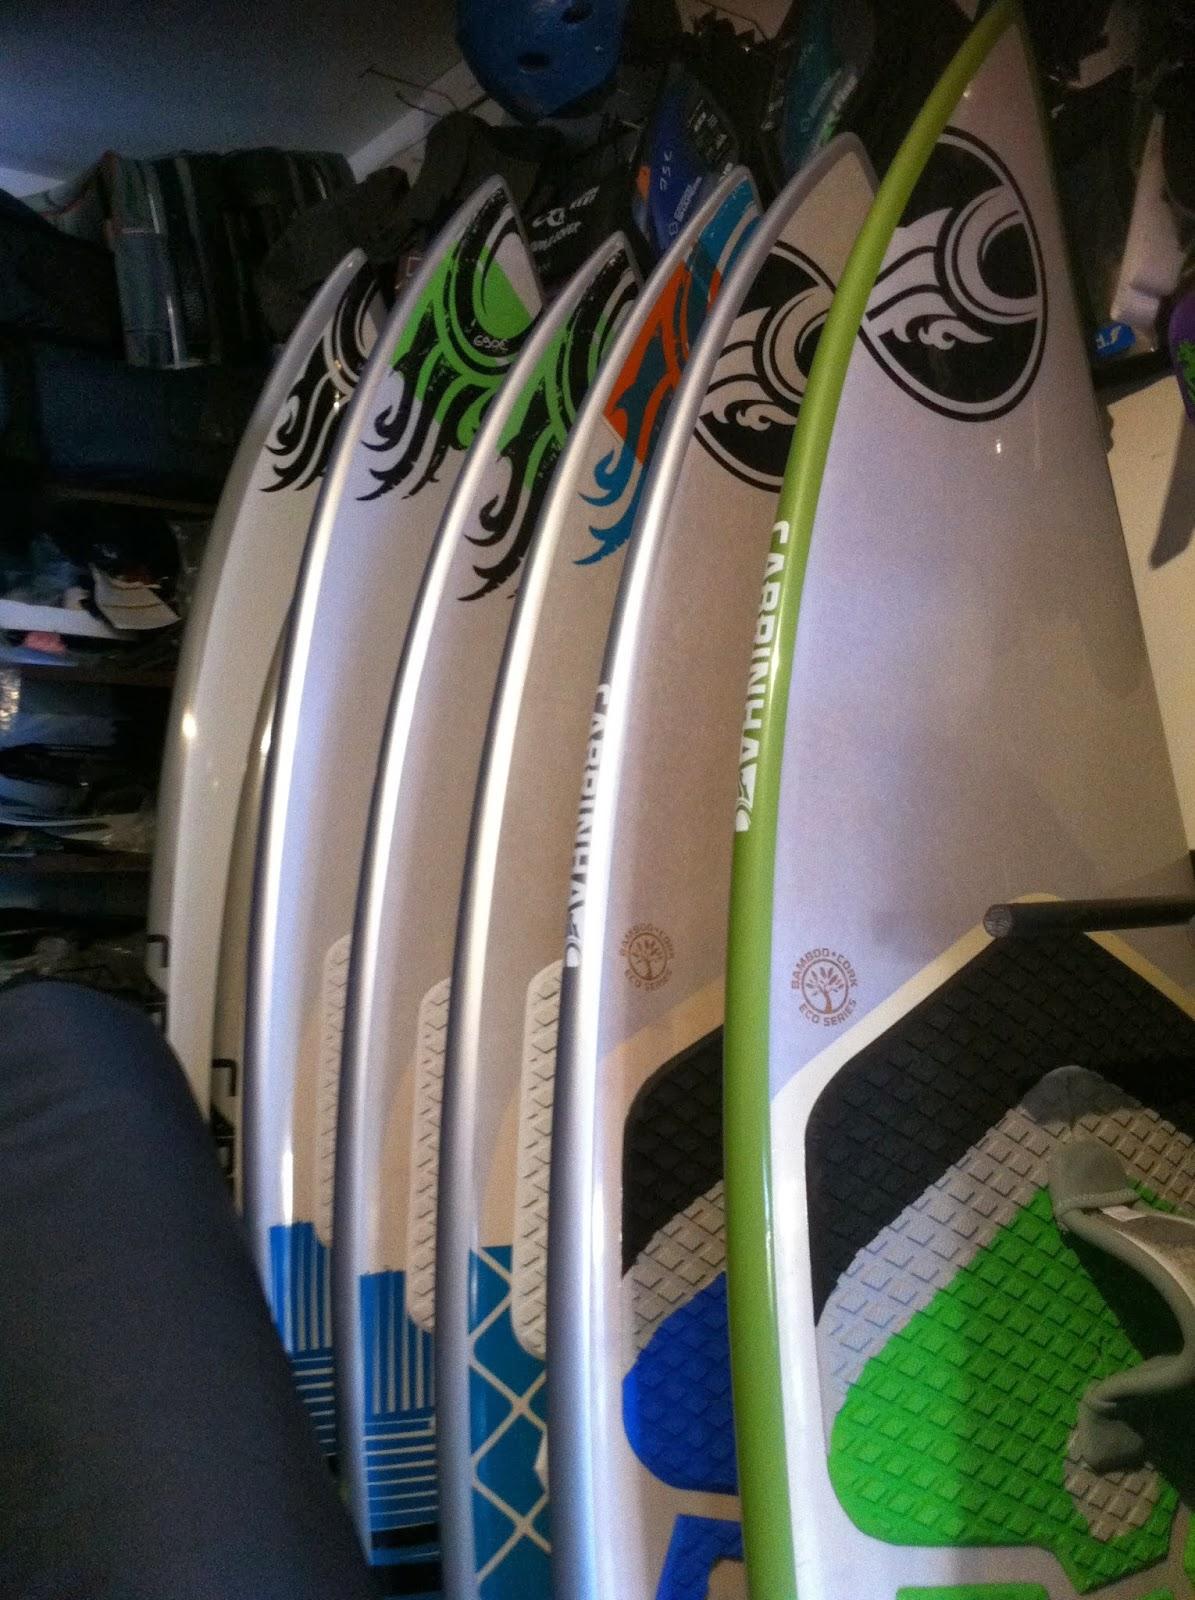 reunion windsurf kitesurf sup shop. Black Bedroom Furniture Sets. Home Design Ideas